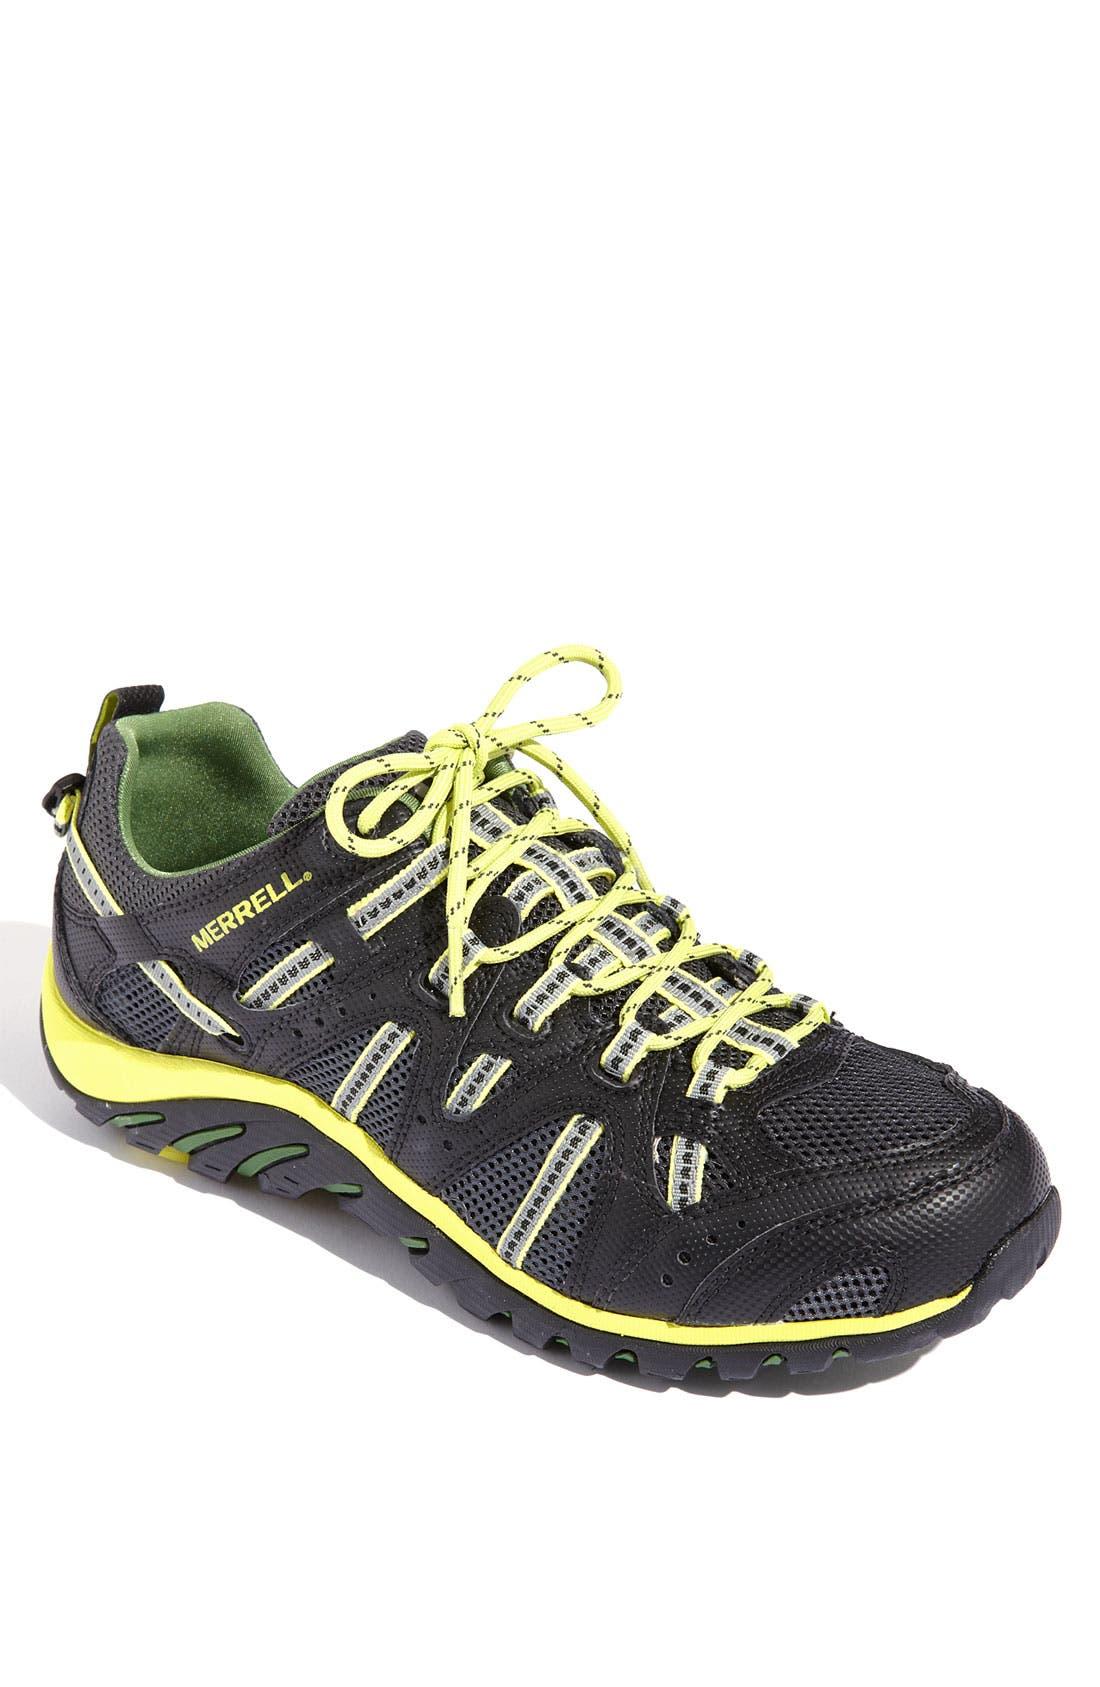 Main Image - Merrell 'Waterpro Manistee' Trail Shoe (Men)